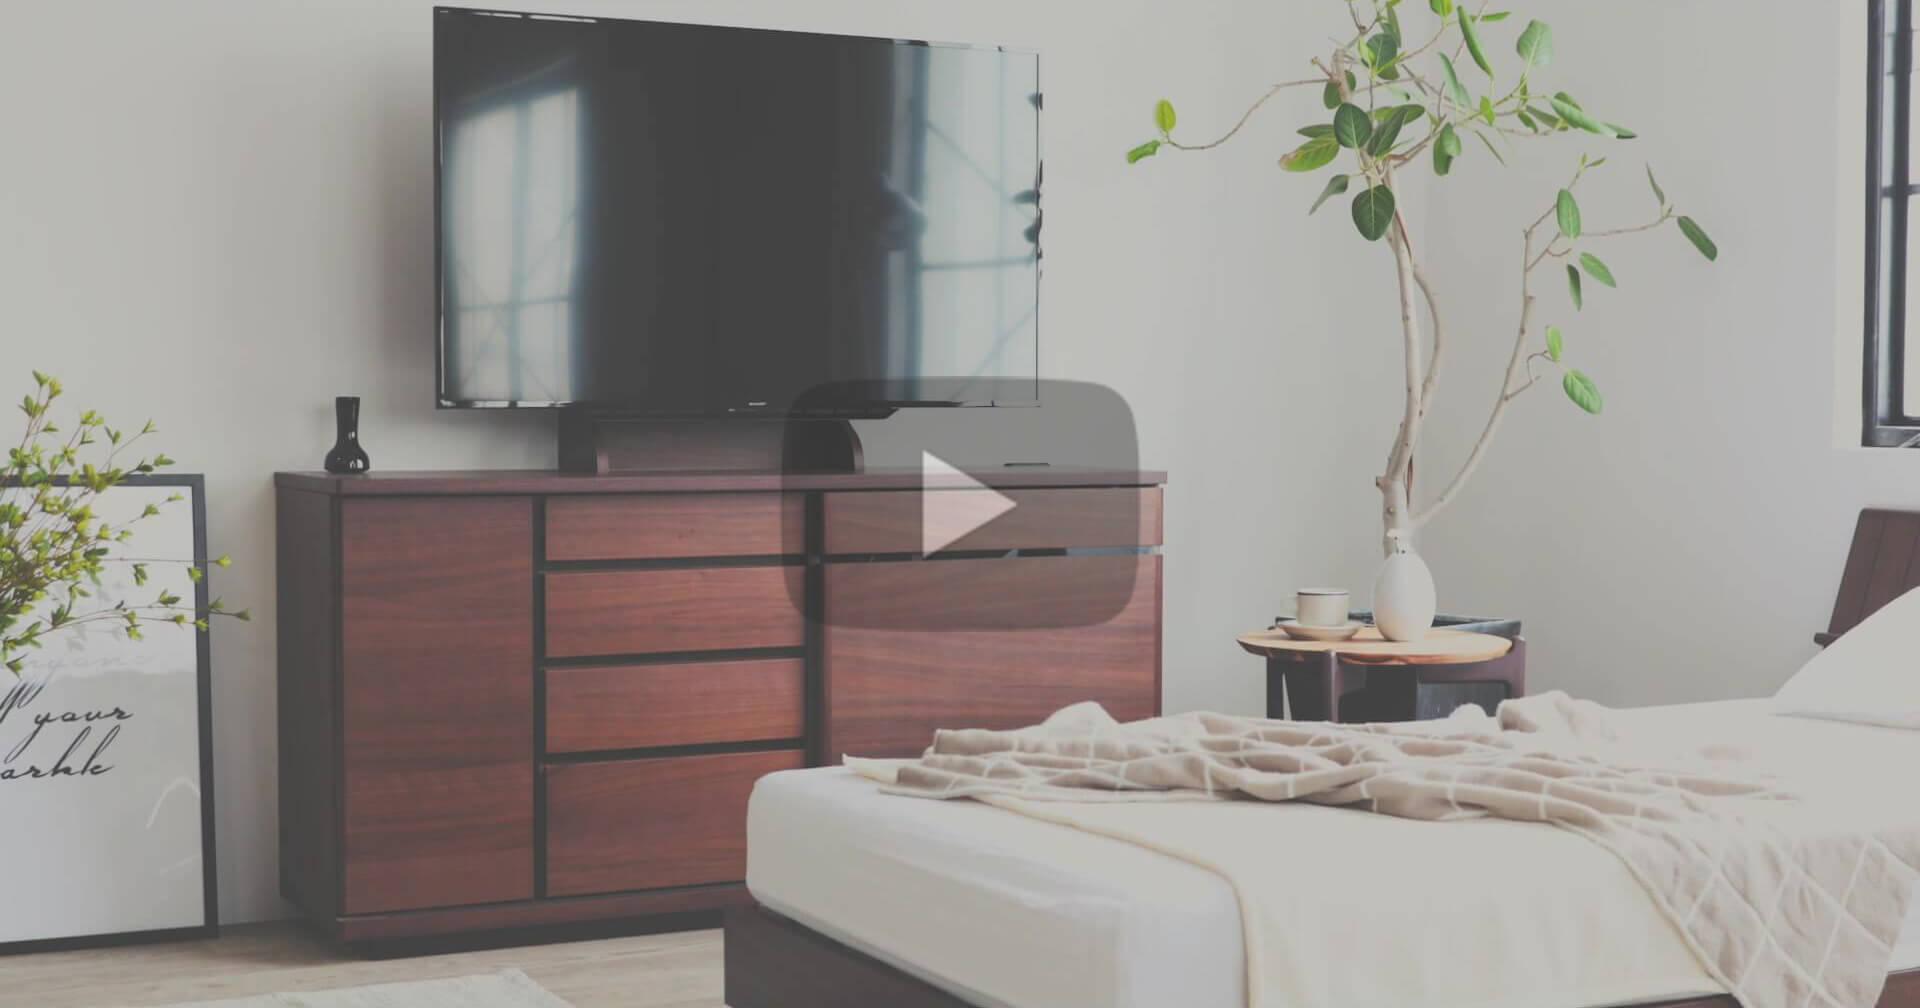 『storage / ストレージ』の商品説明動画を公開しました